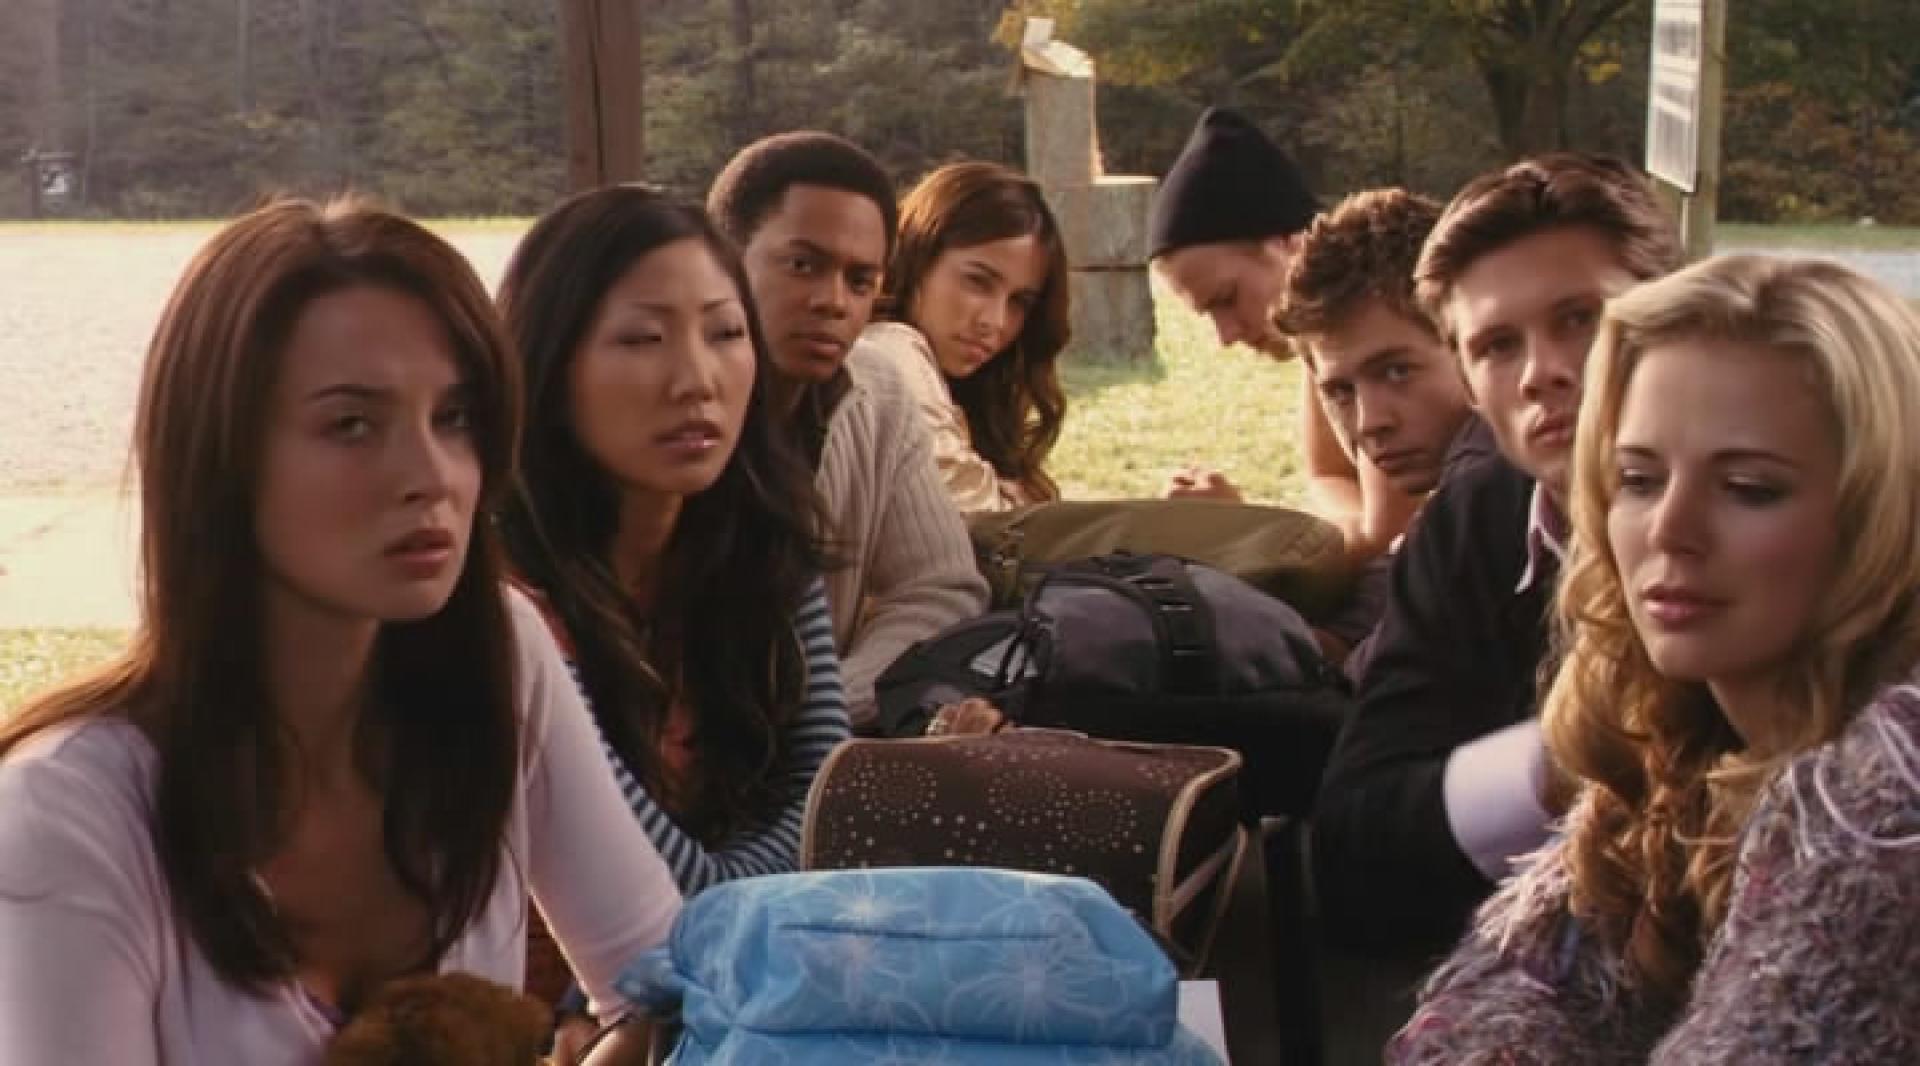 Grizzly Park - Nyolc préda (2008) 1. kép